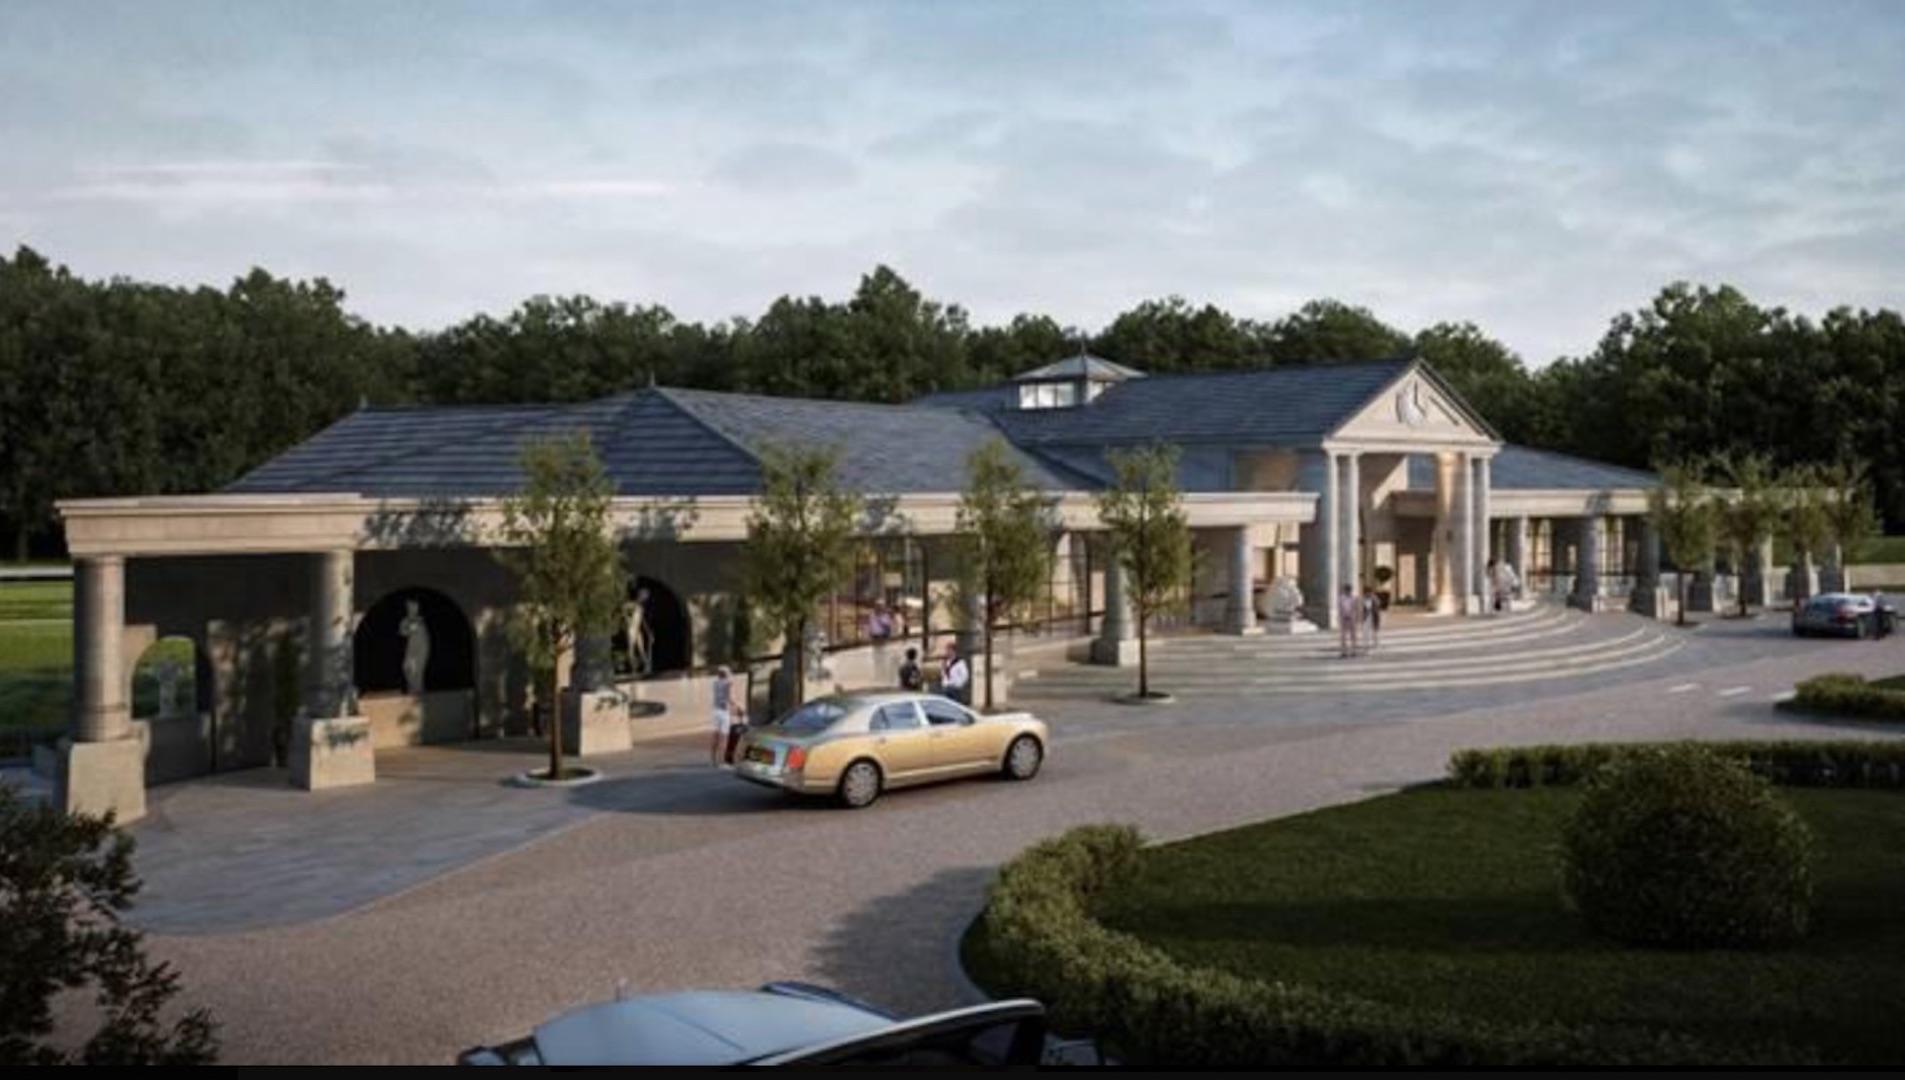 £240 million plans revealed